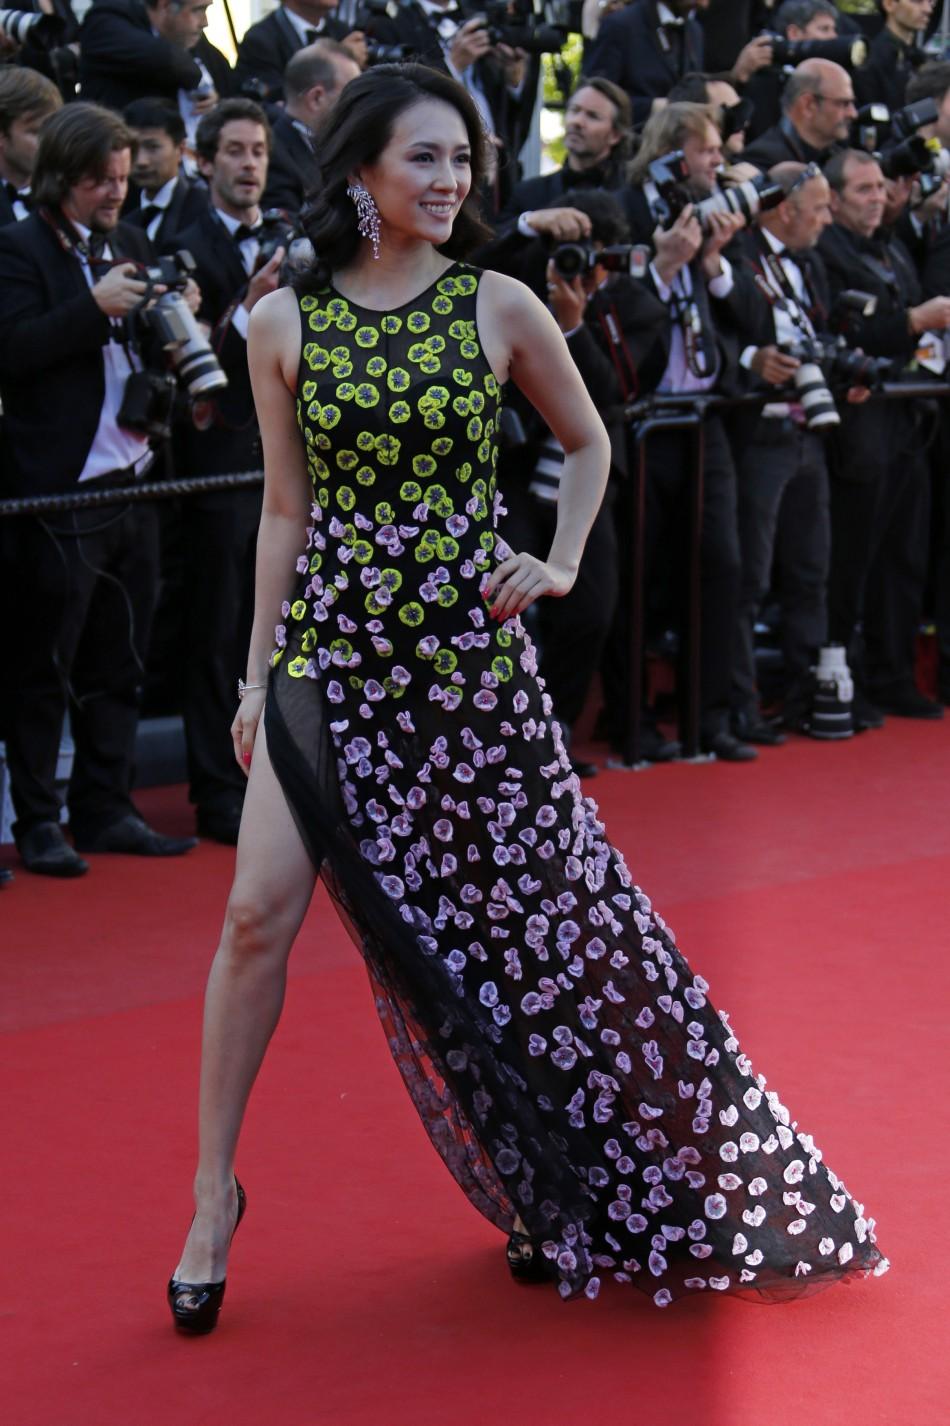 Cannes Film Festival 2013 Closing Ceremony Nicole Kidman